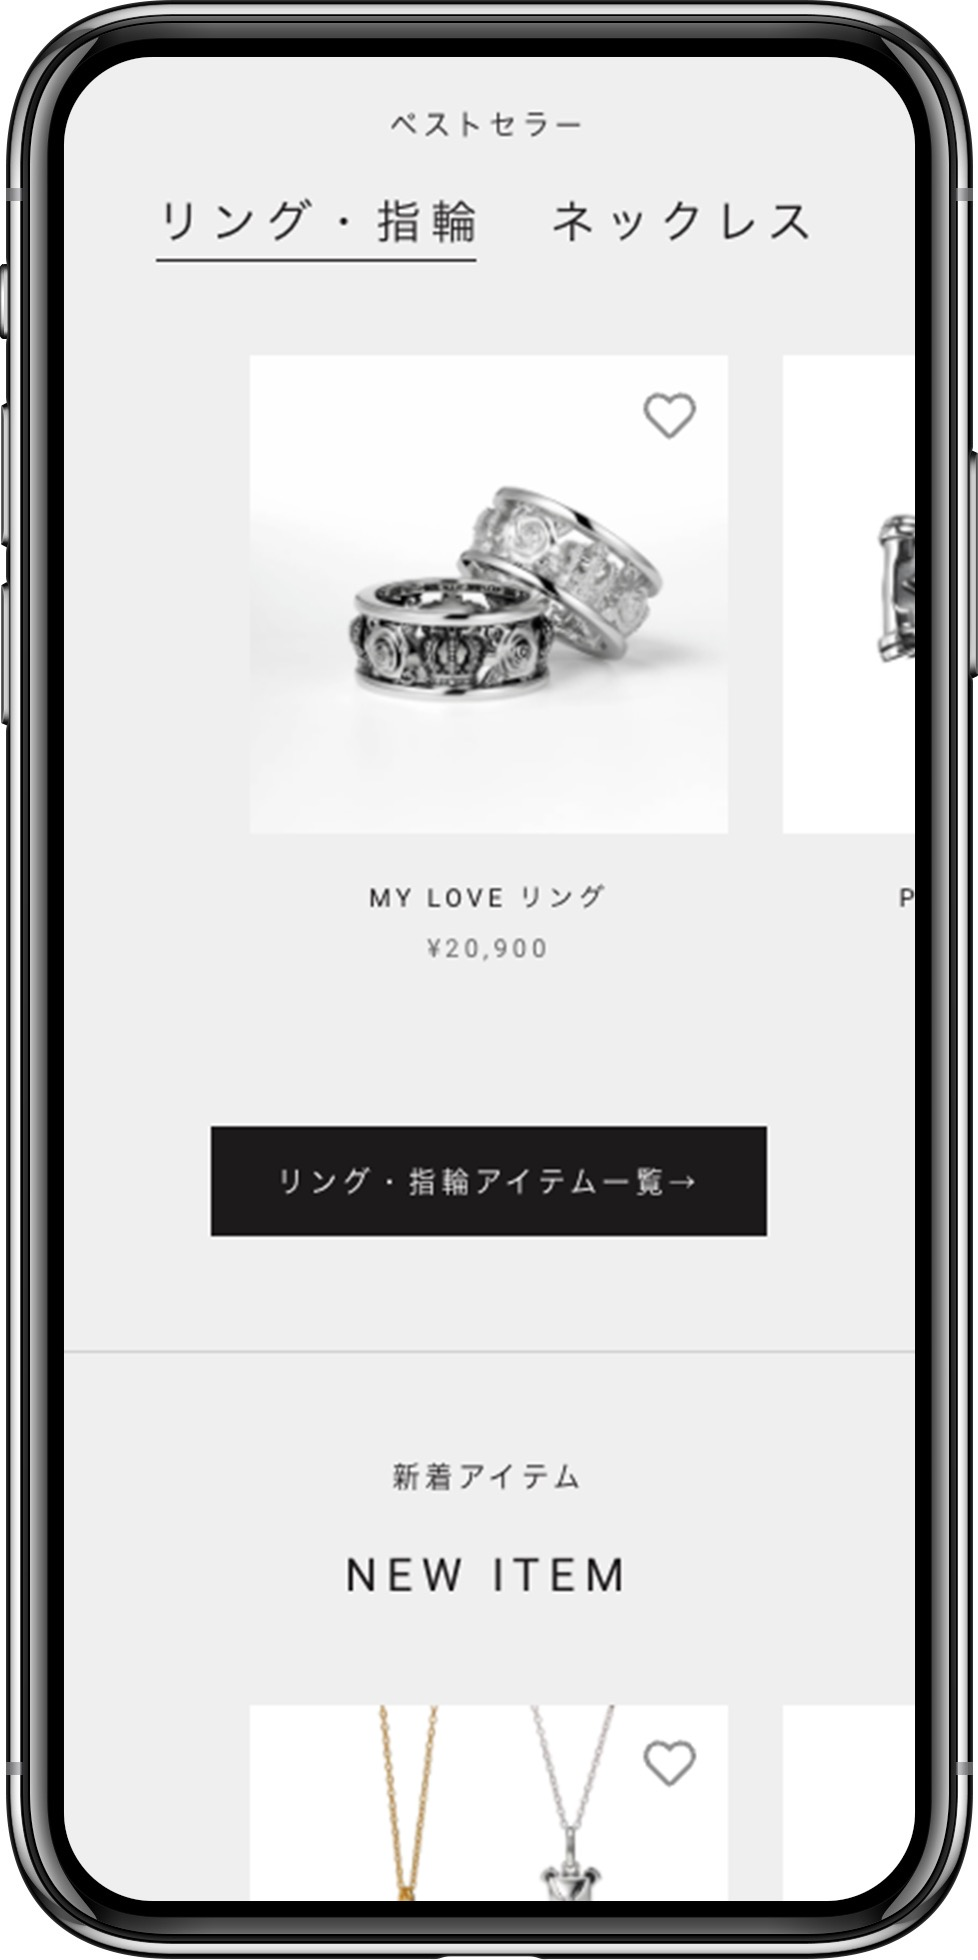 https://artpeace.jp/wp-content/uploads/2021/10/flame_sample.png